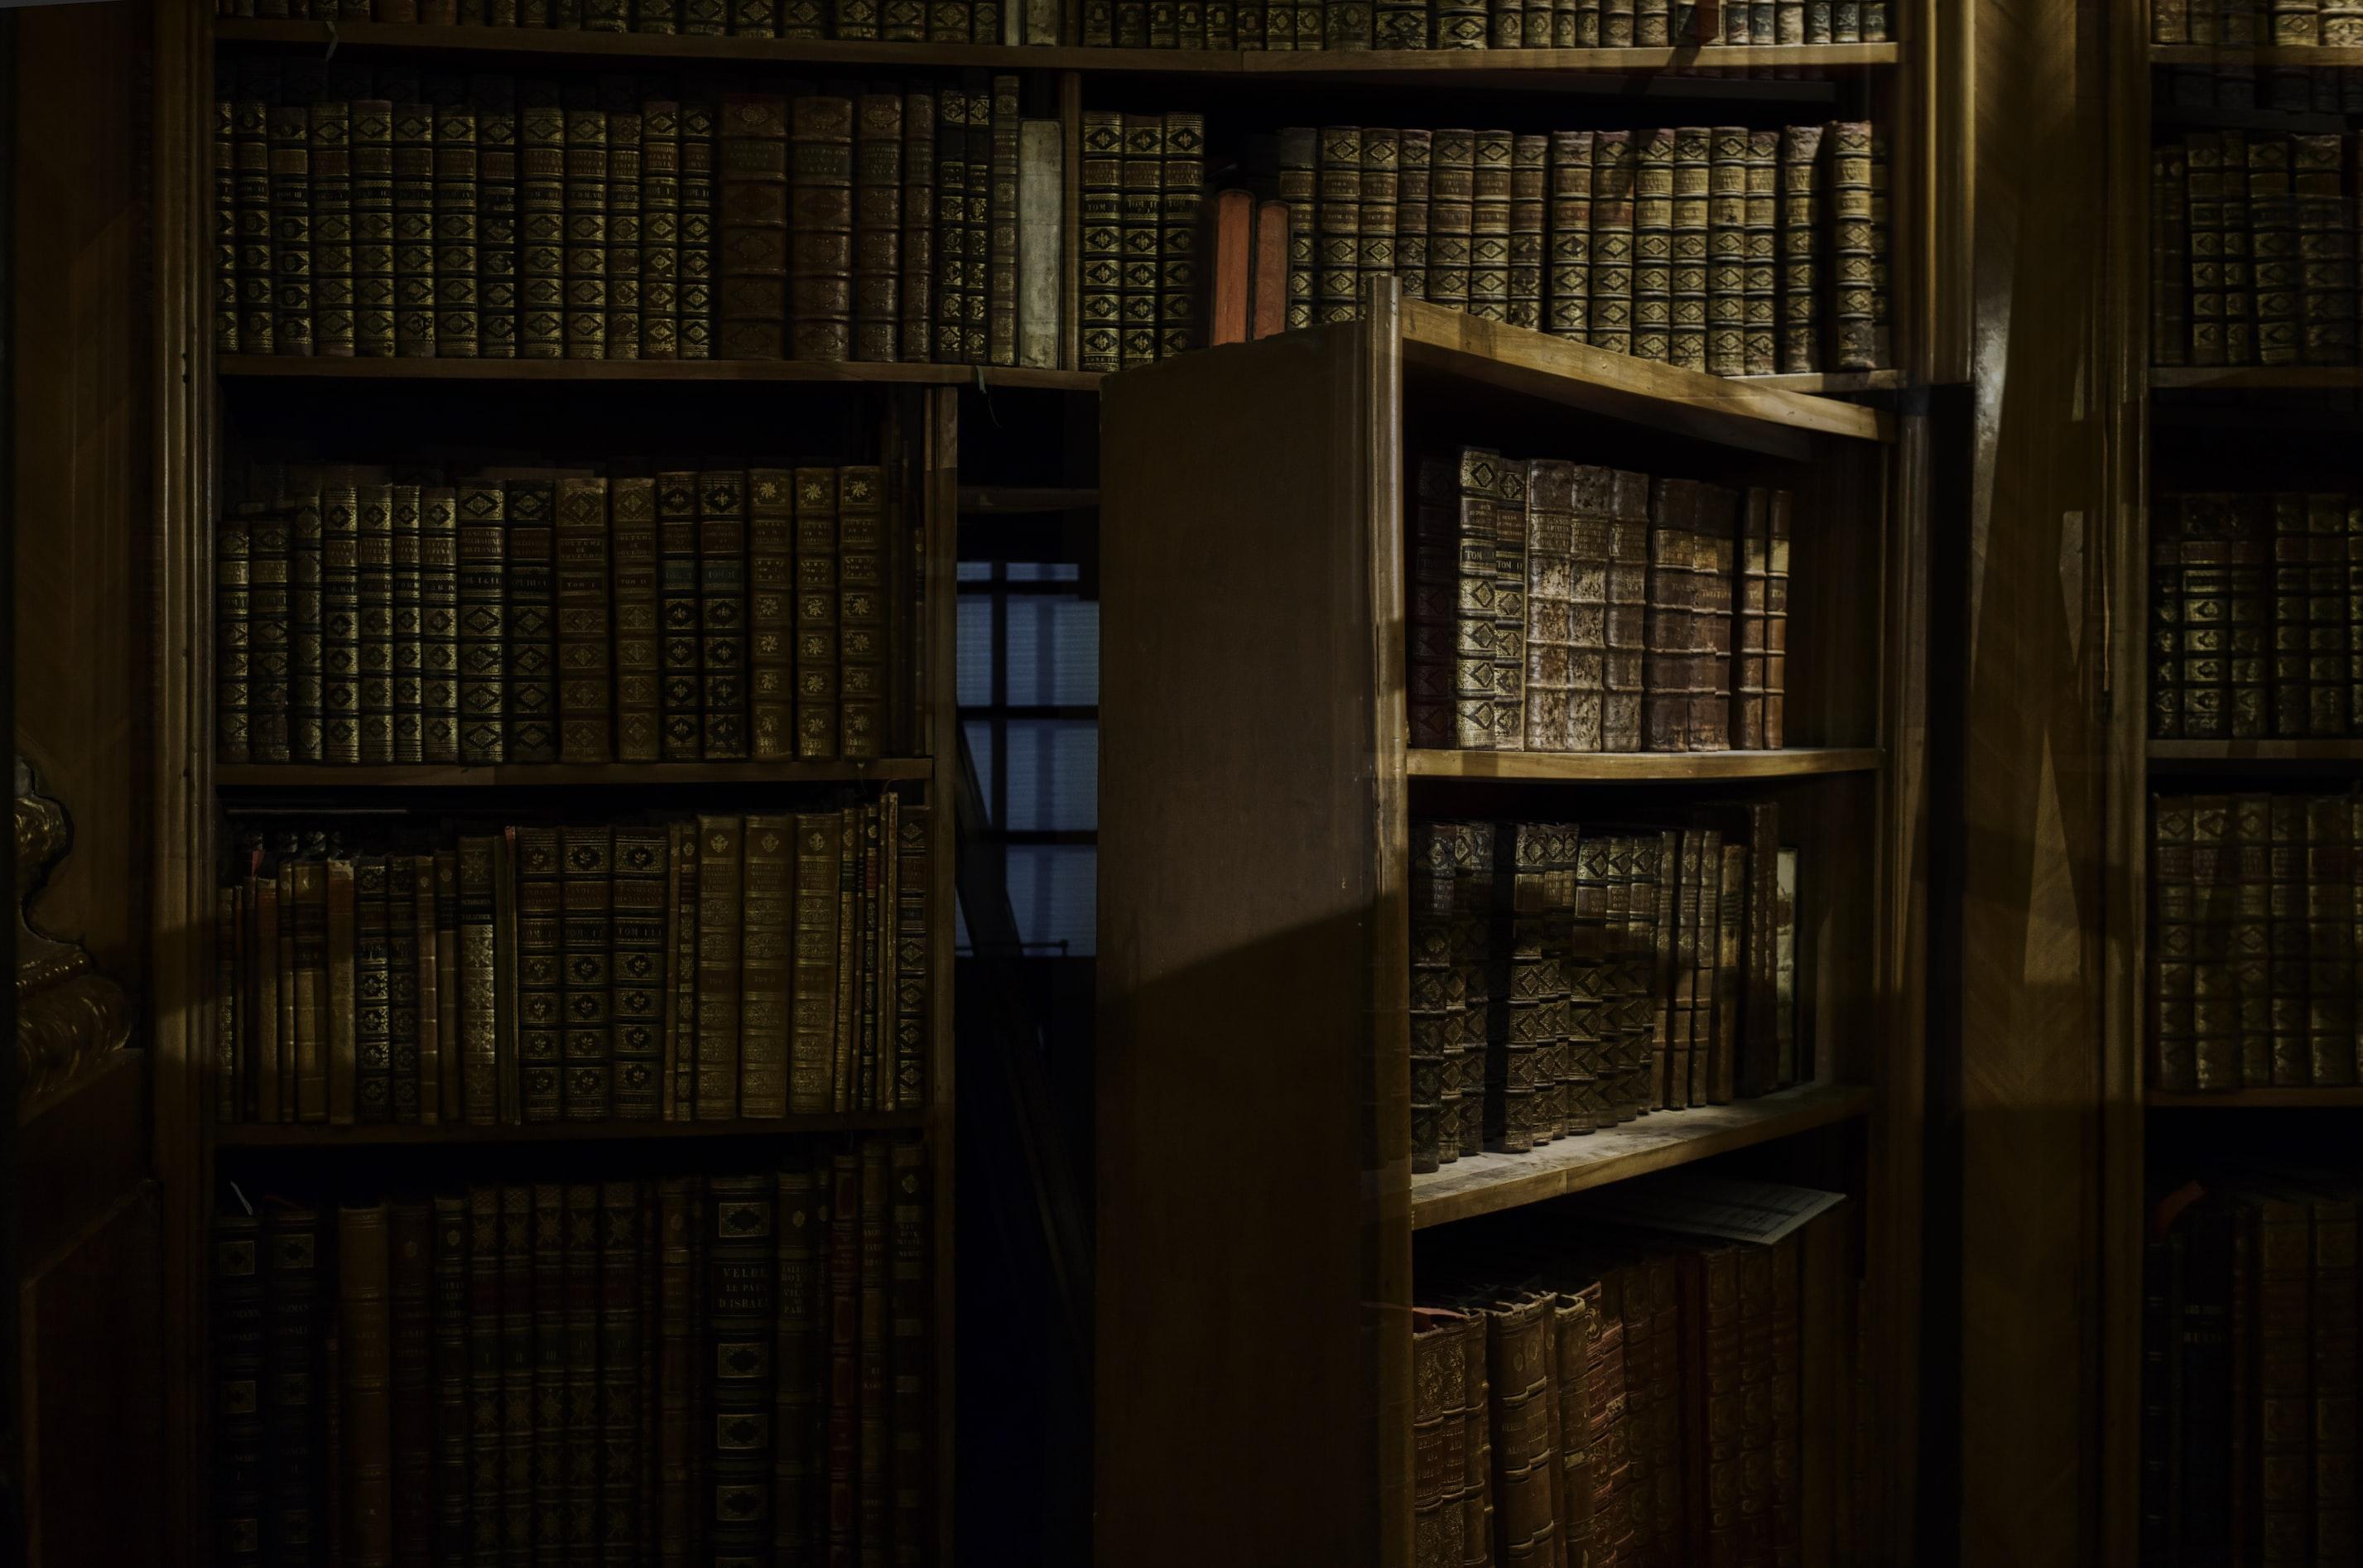 Shortcut through a secret bookshelf door